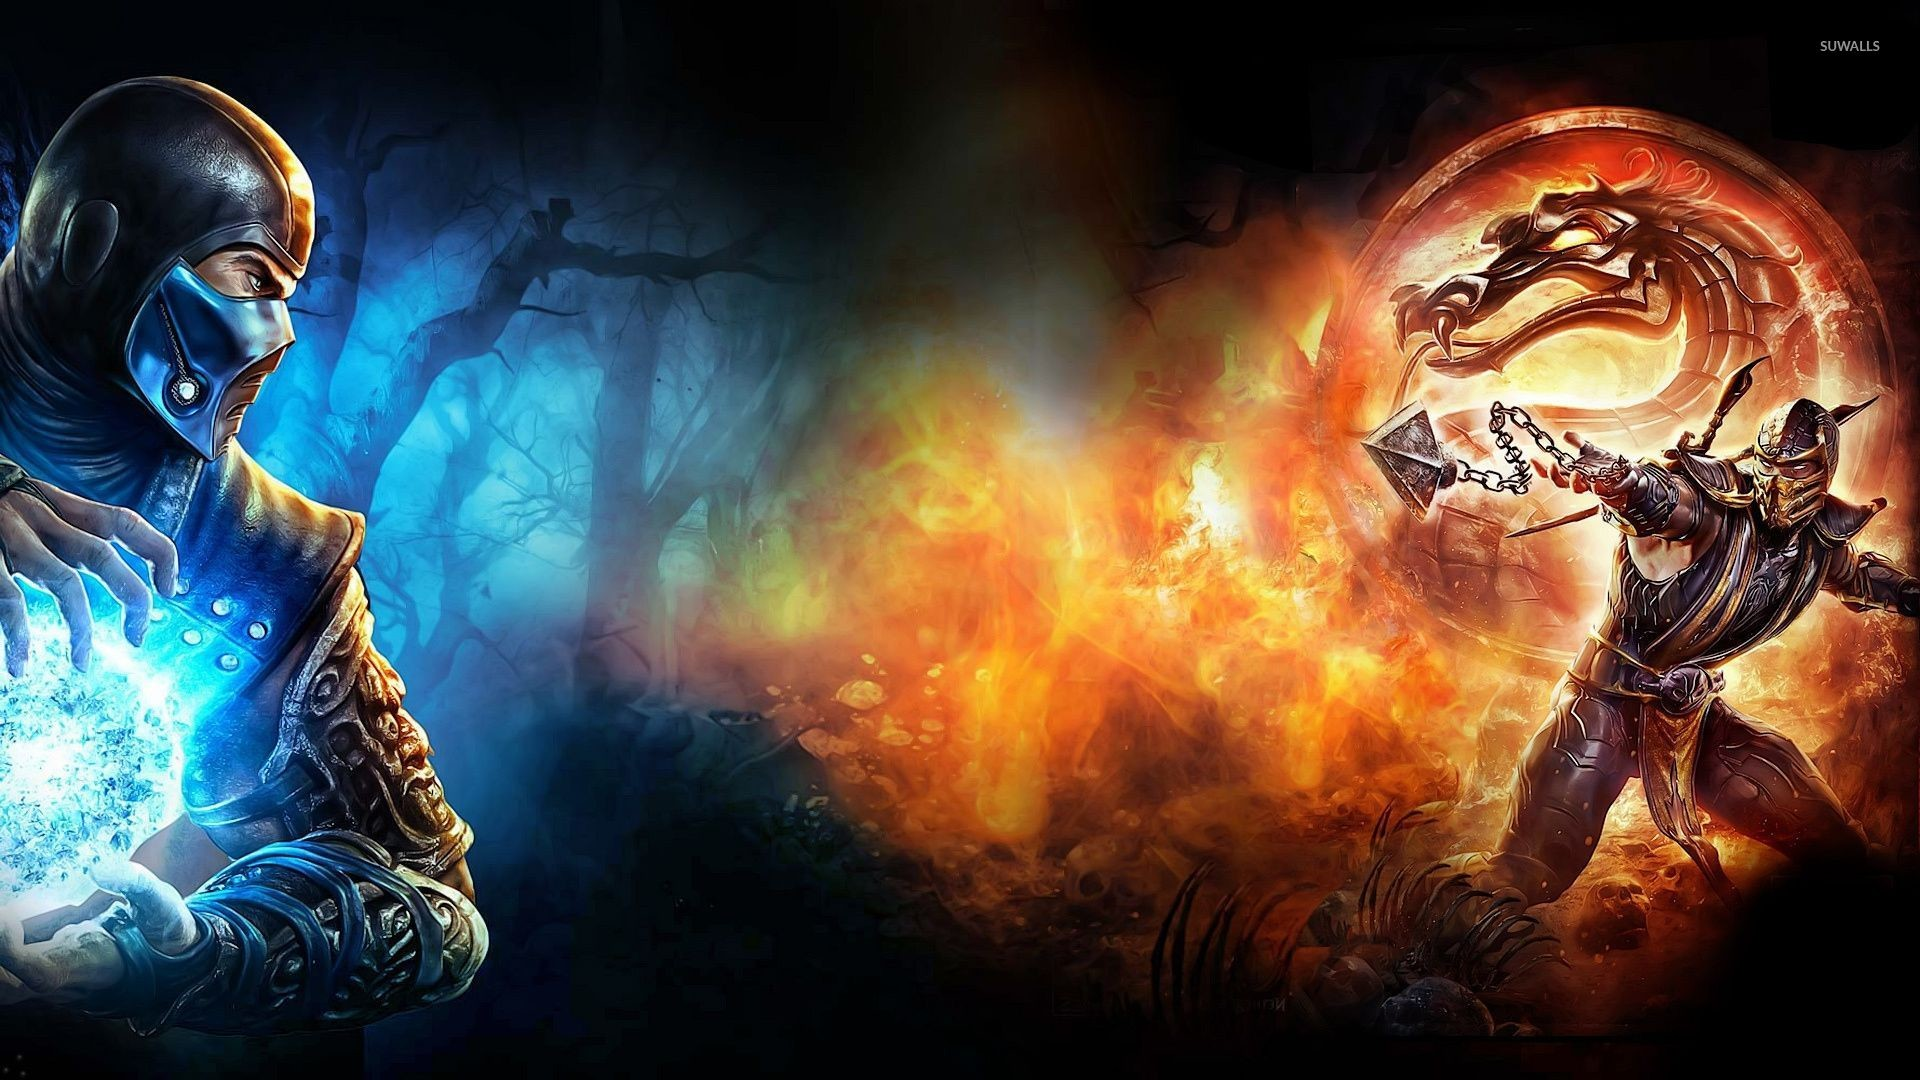 Sub-Zero vs Scorpion in Mortal Kombat X wallpaper